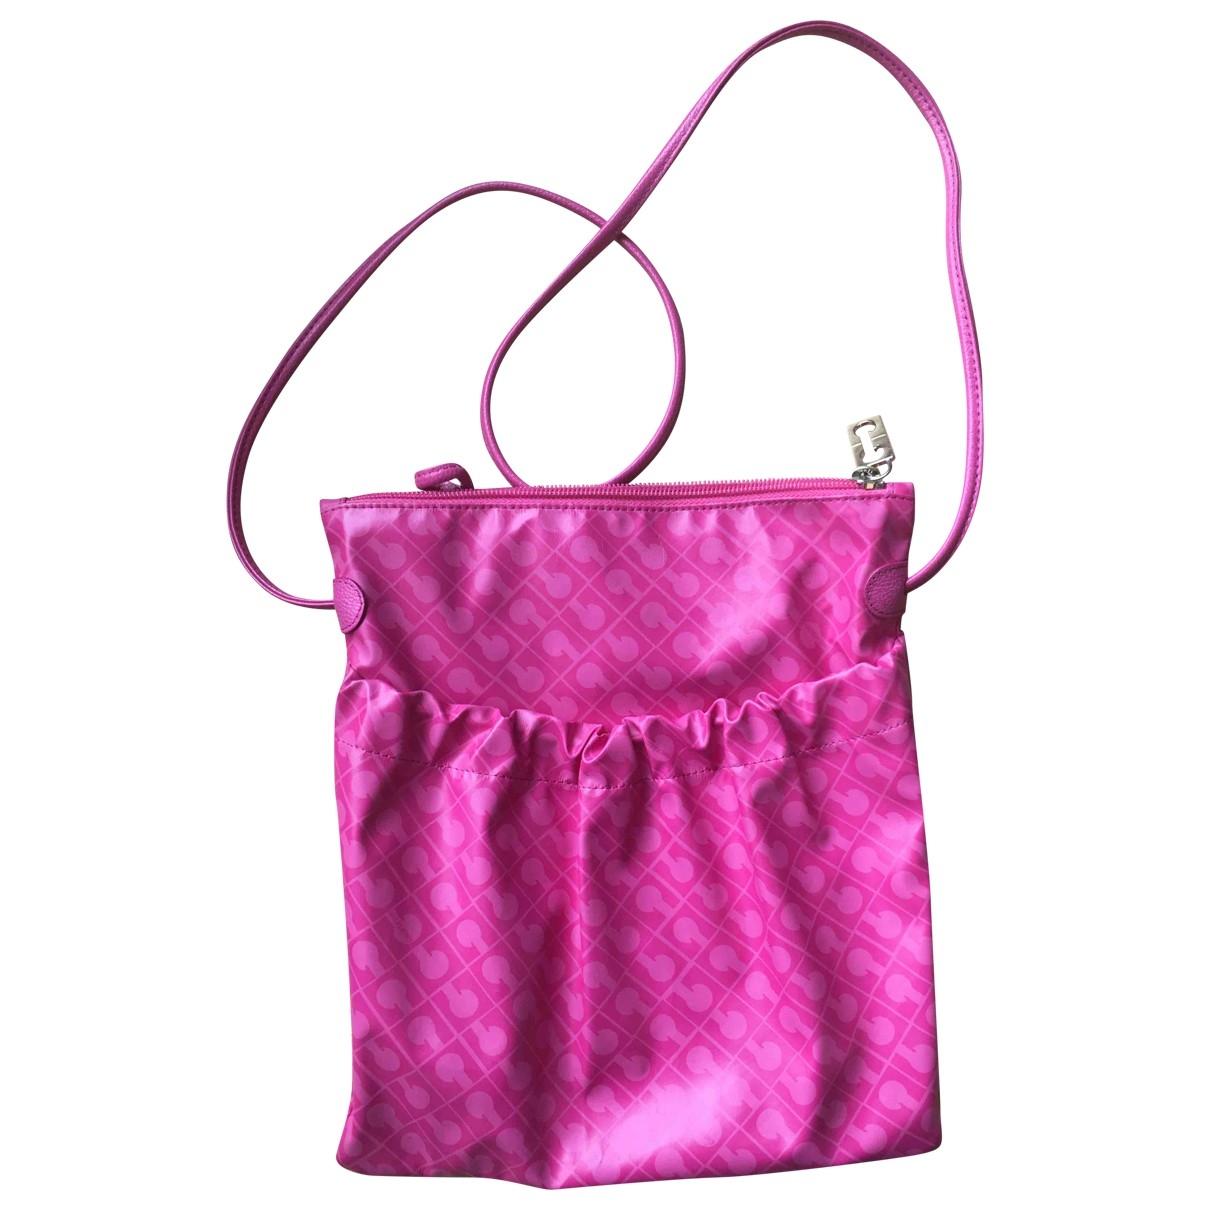 Gherardini \N Pink Cloth handbag for Women \N